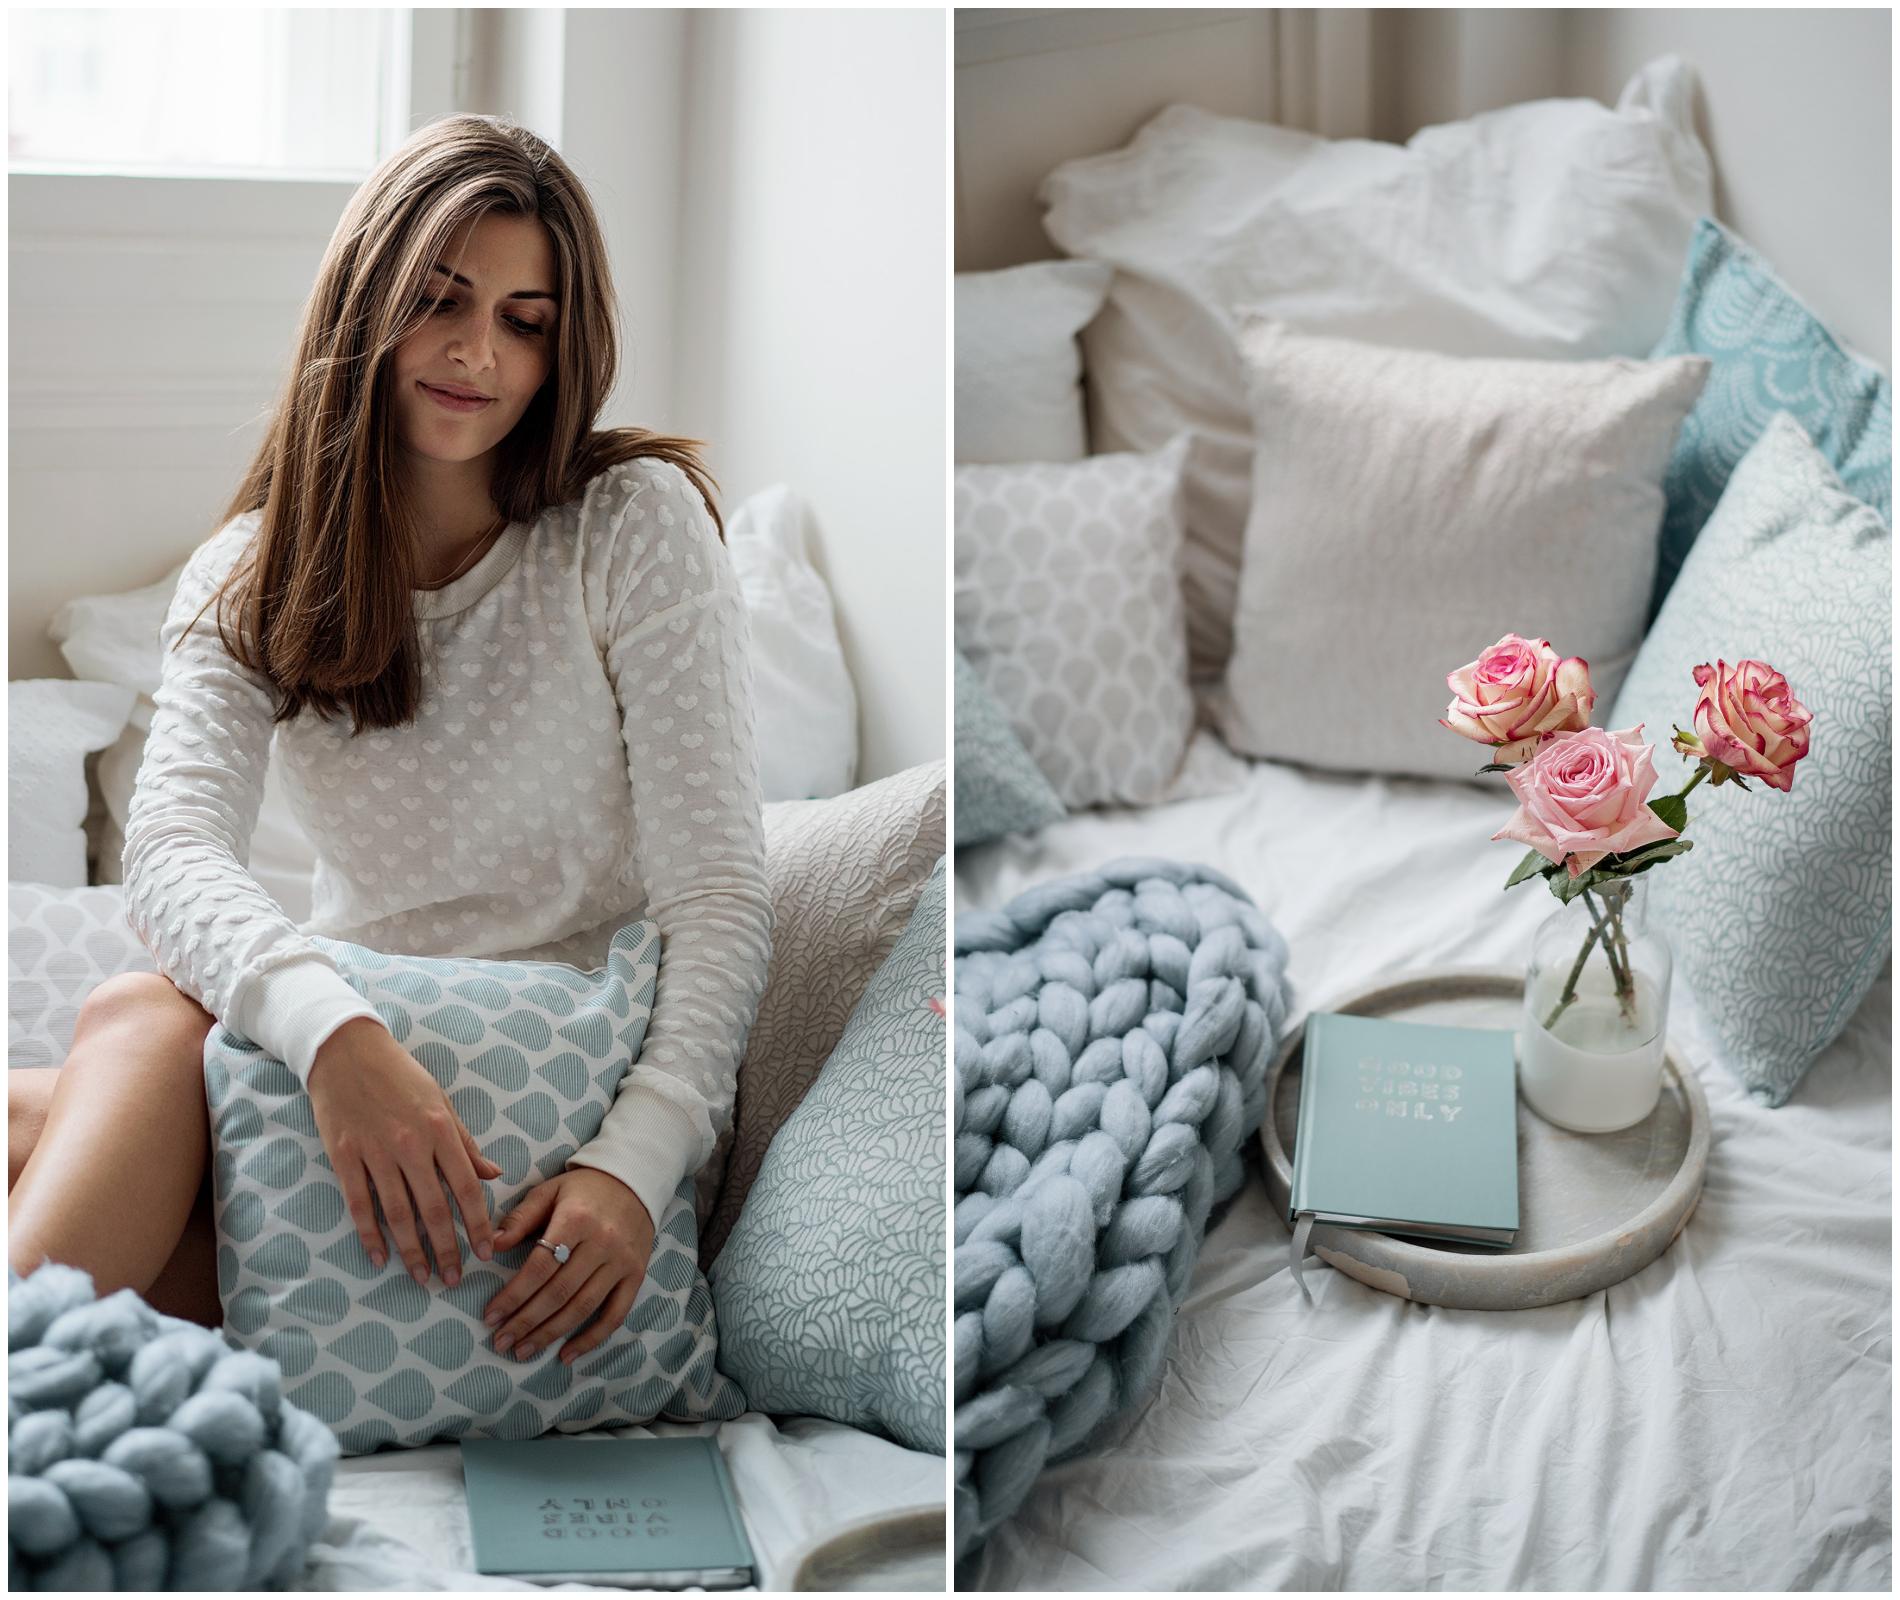 esprit neue kollektion esprit 14 valentinsrabatt auf die neue kollektion esprit gutschein alle. Black Bedroom Furniture Sets. Home Design Ideas